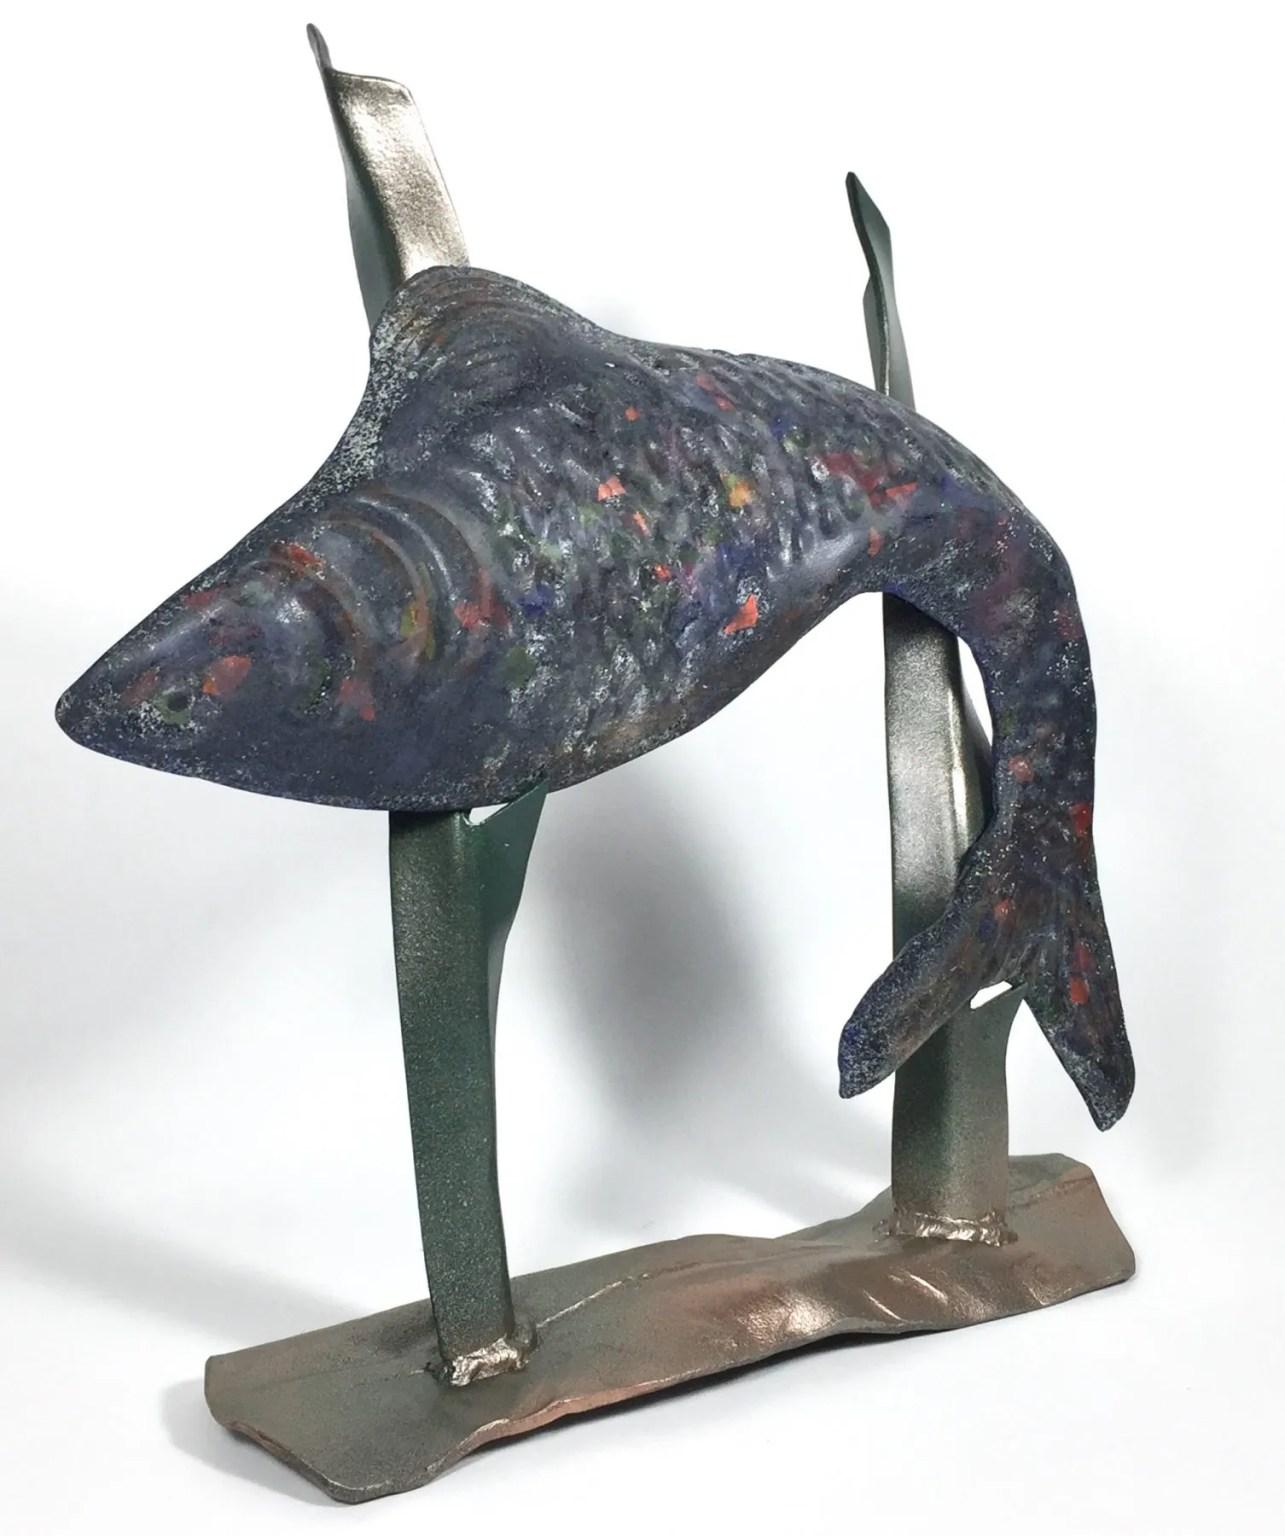 Koi Fish in Seaweed Sculpture by Dori and Jim Settles